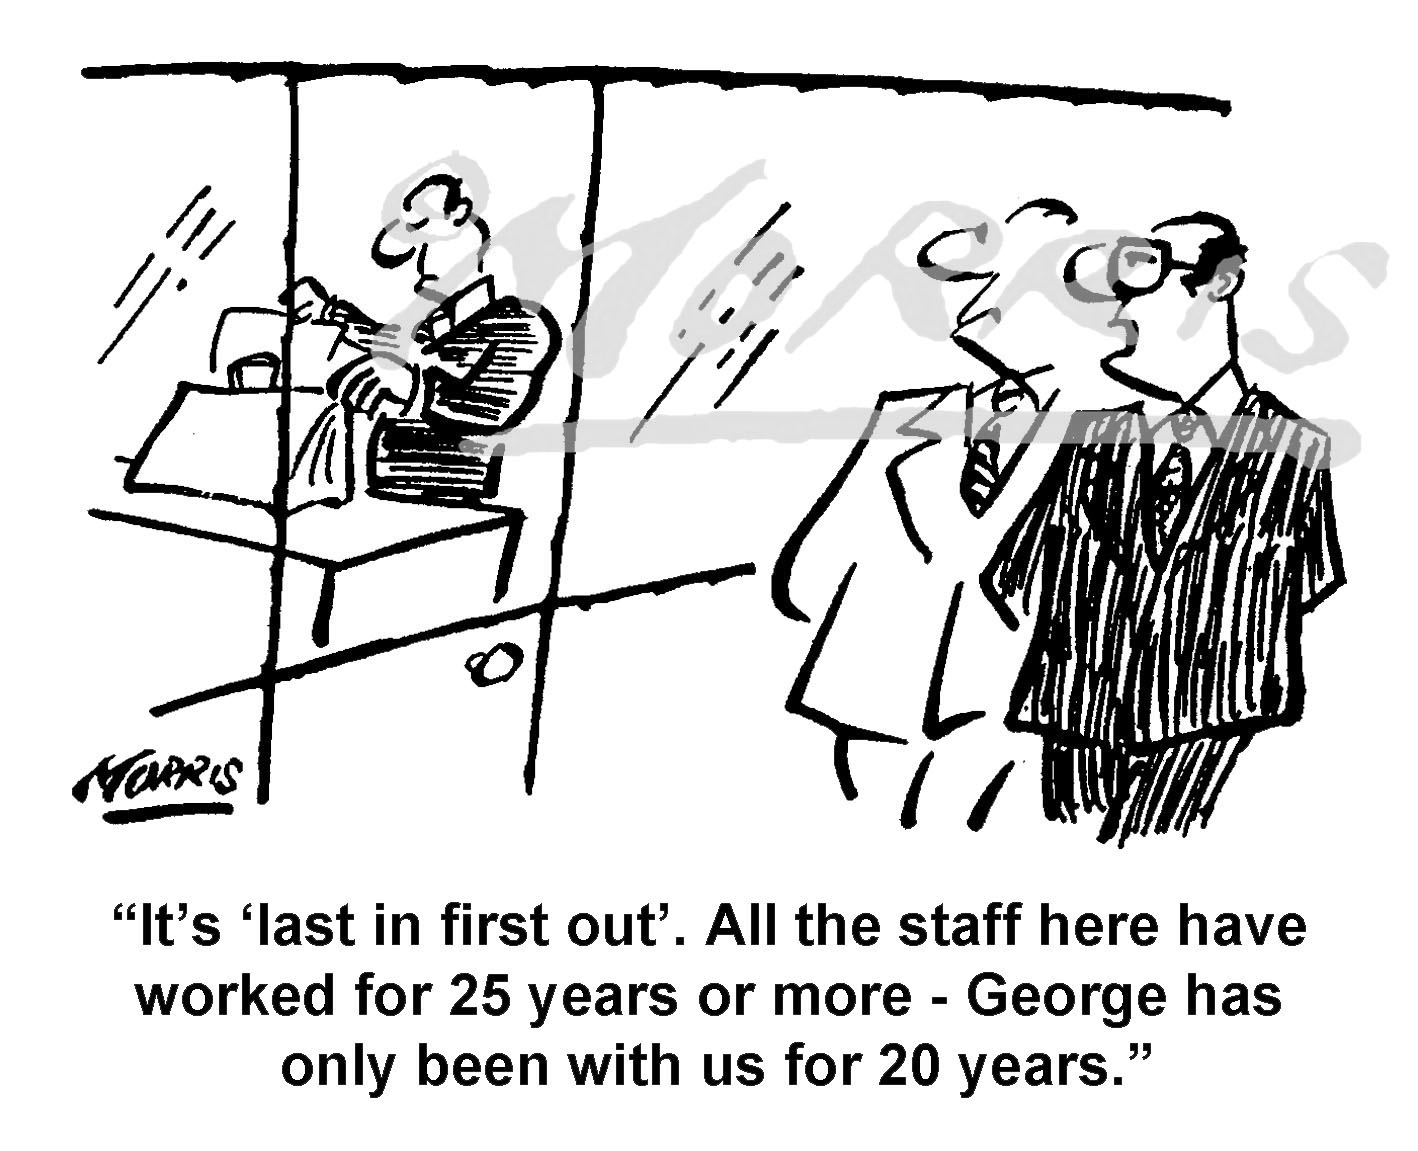 Company staff redundancy policy cartoon – Ref: 8357bw